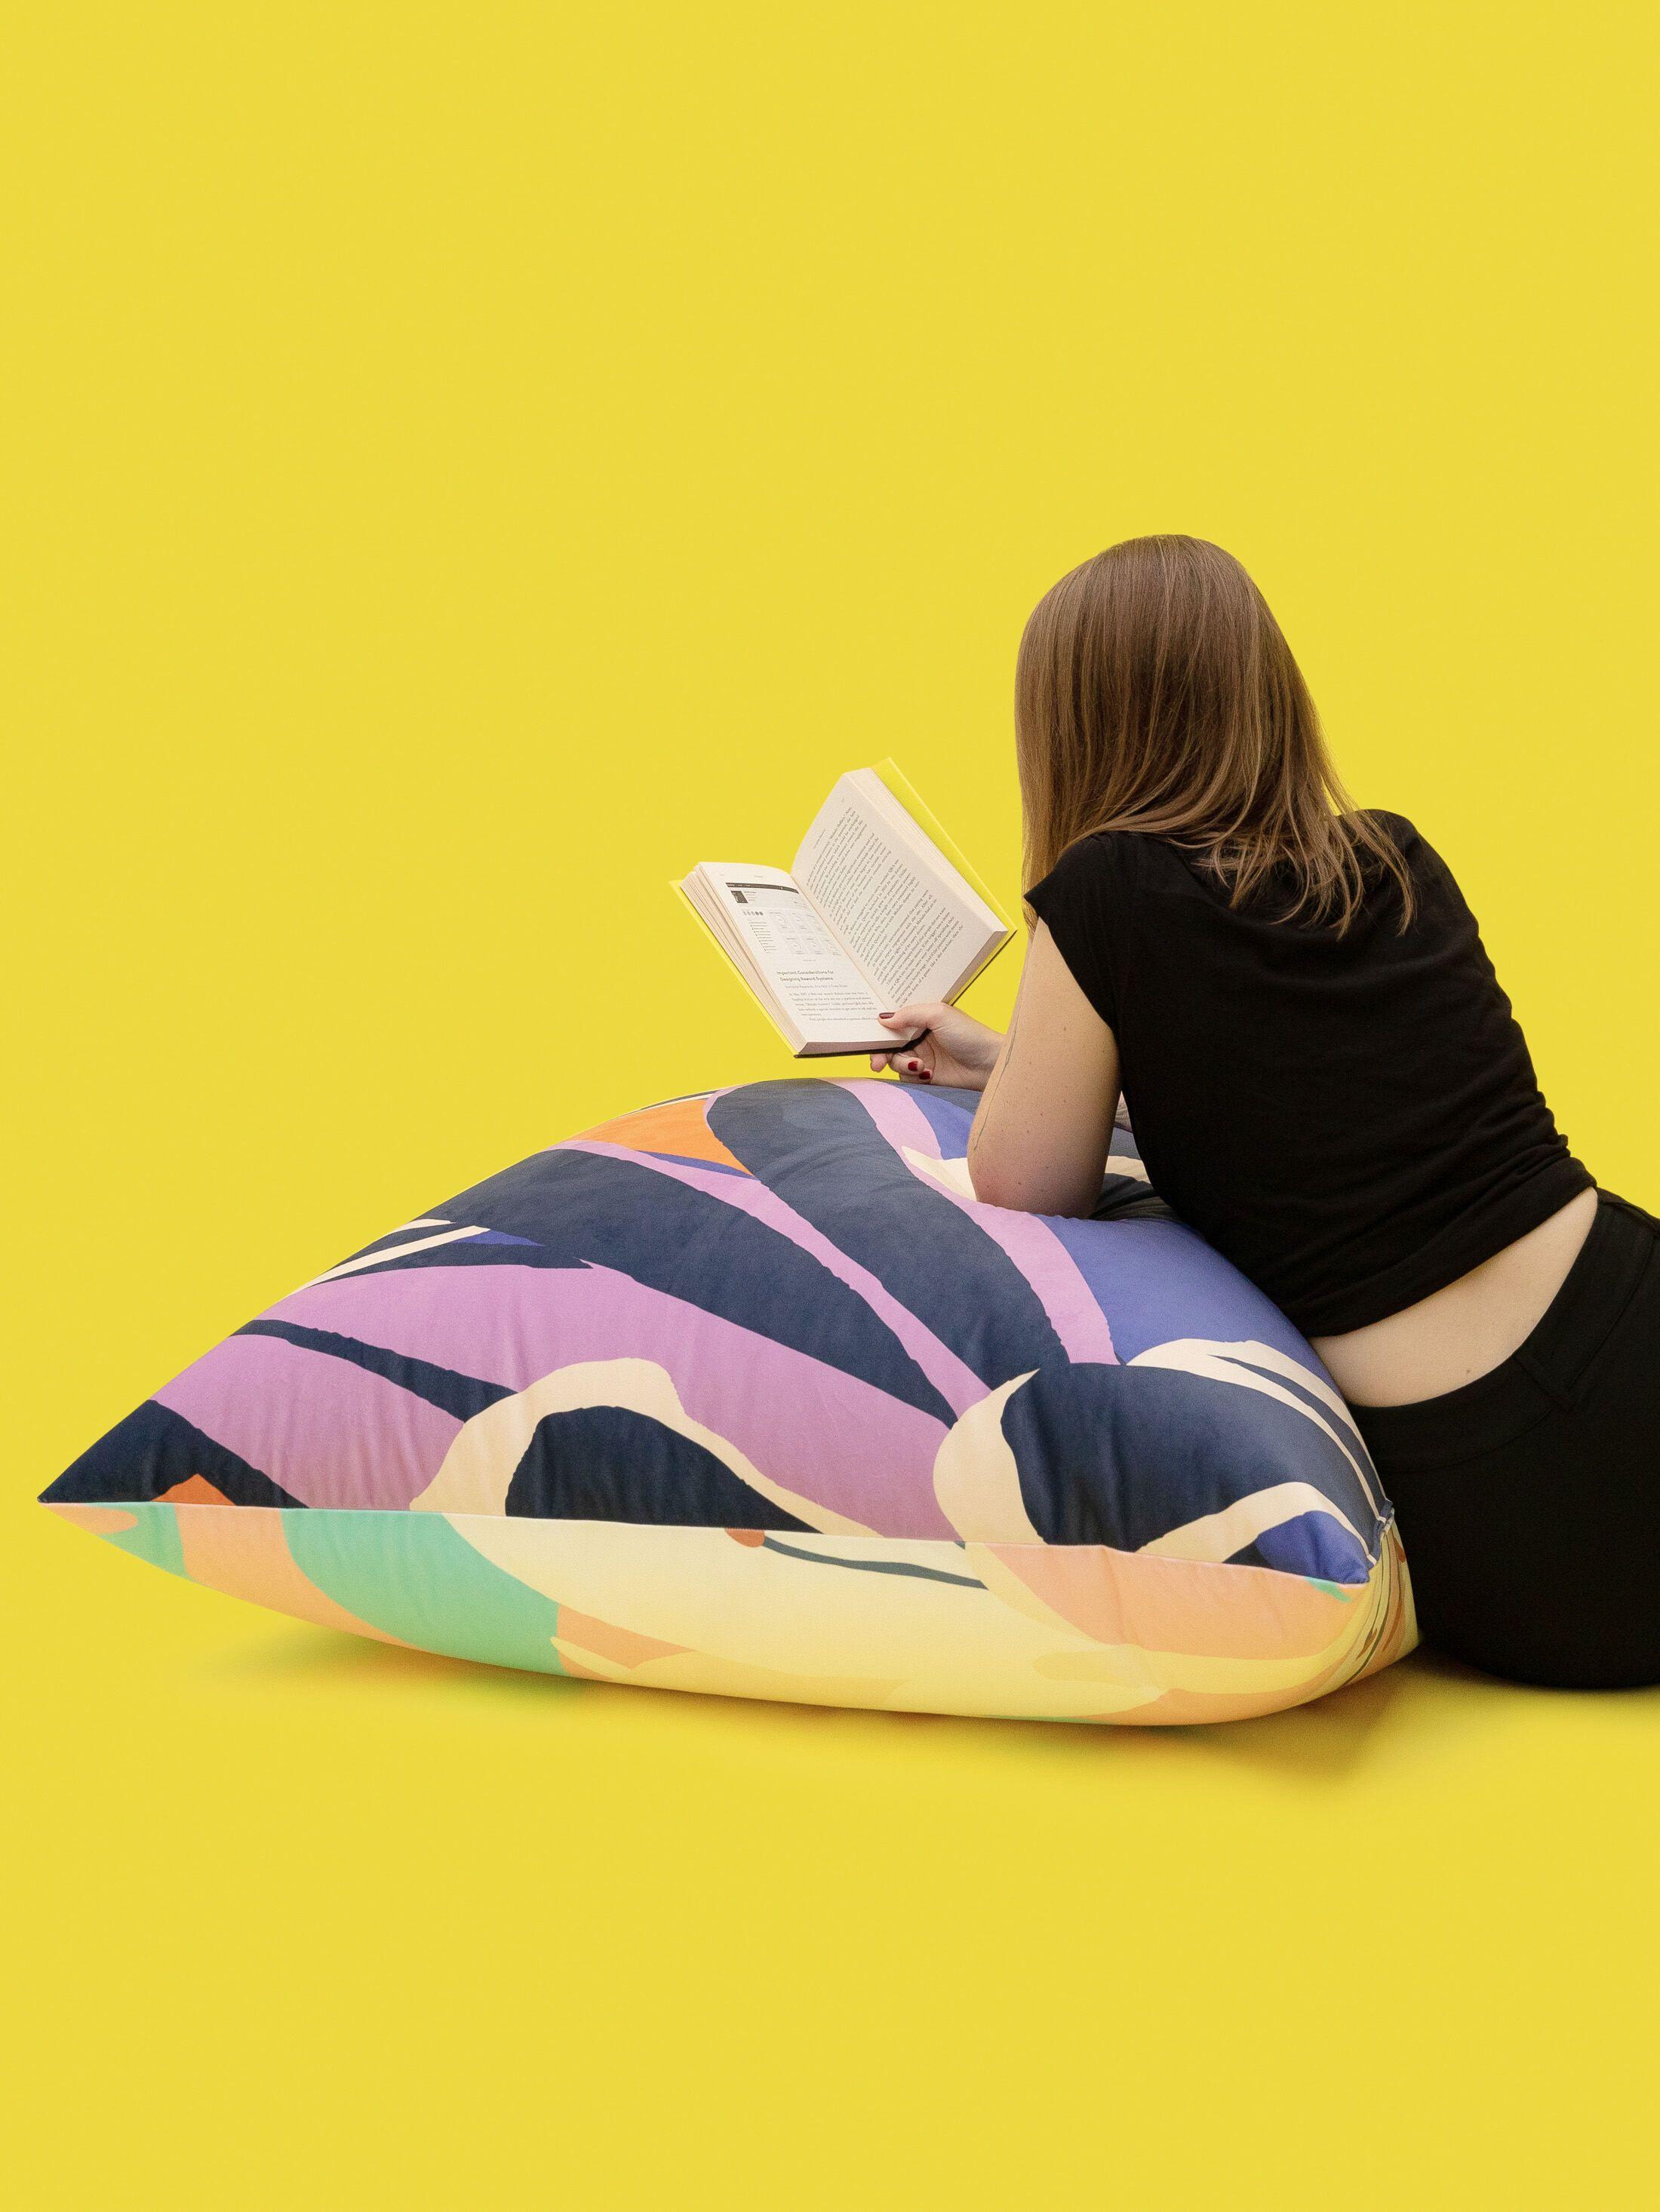 custom large floor cushions cover